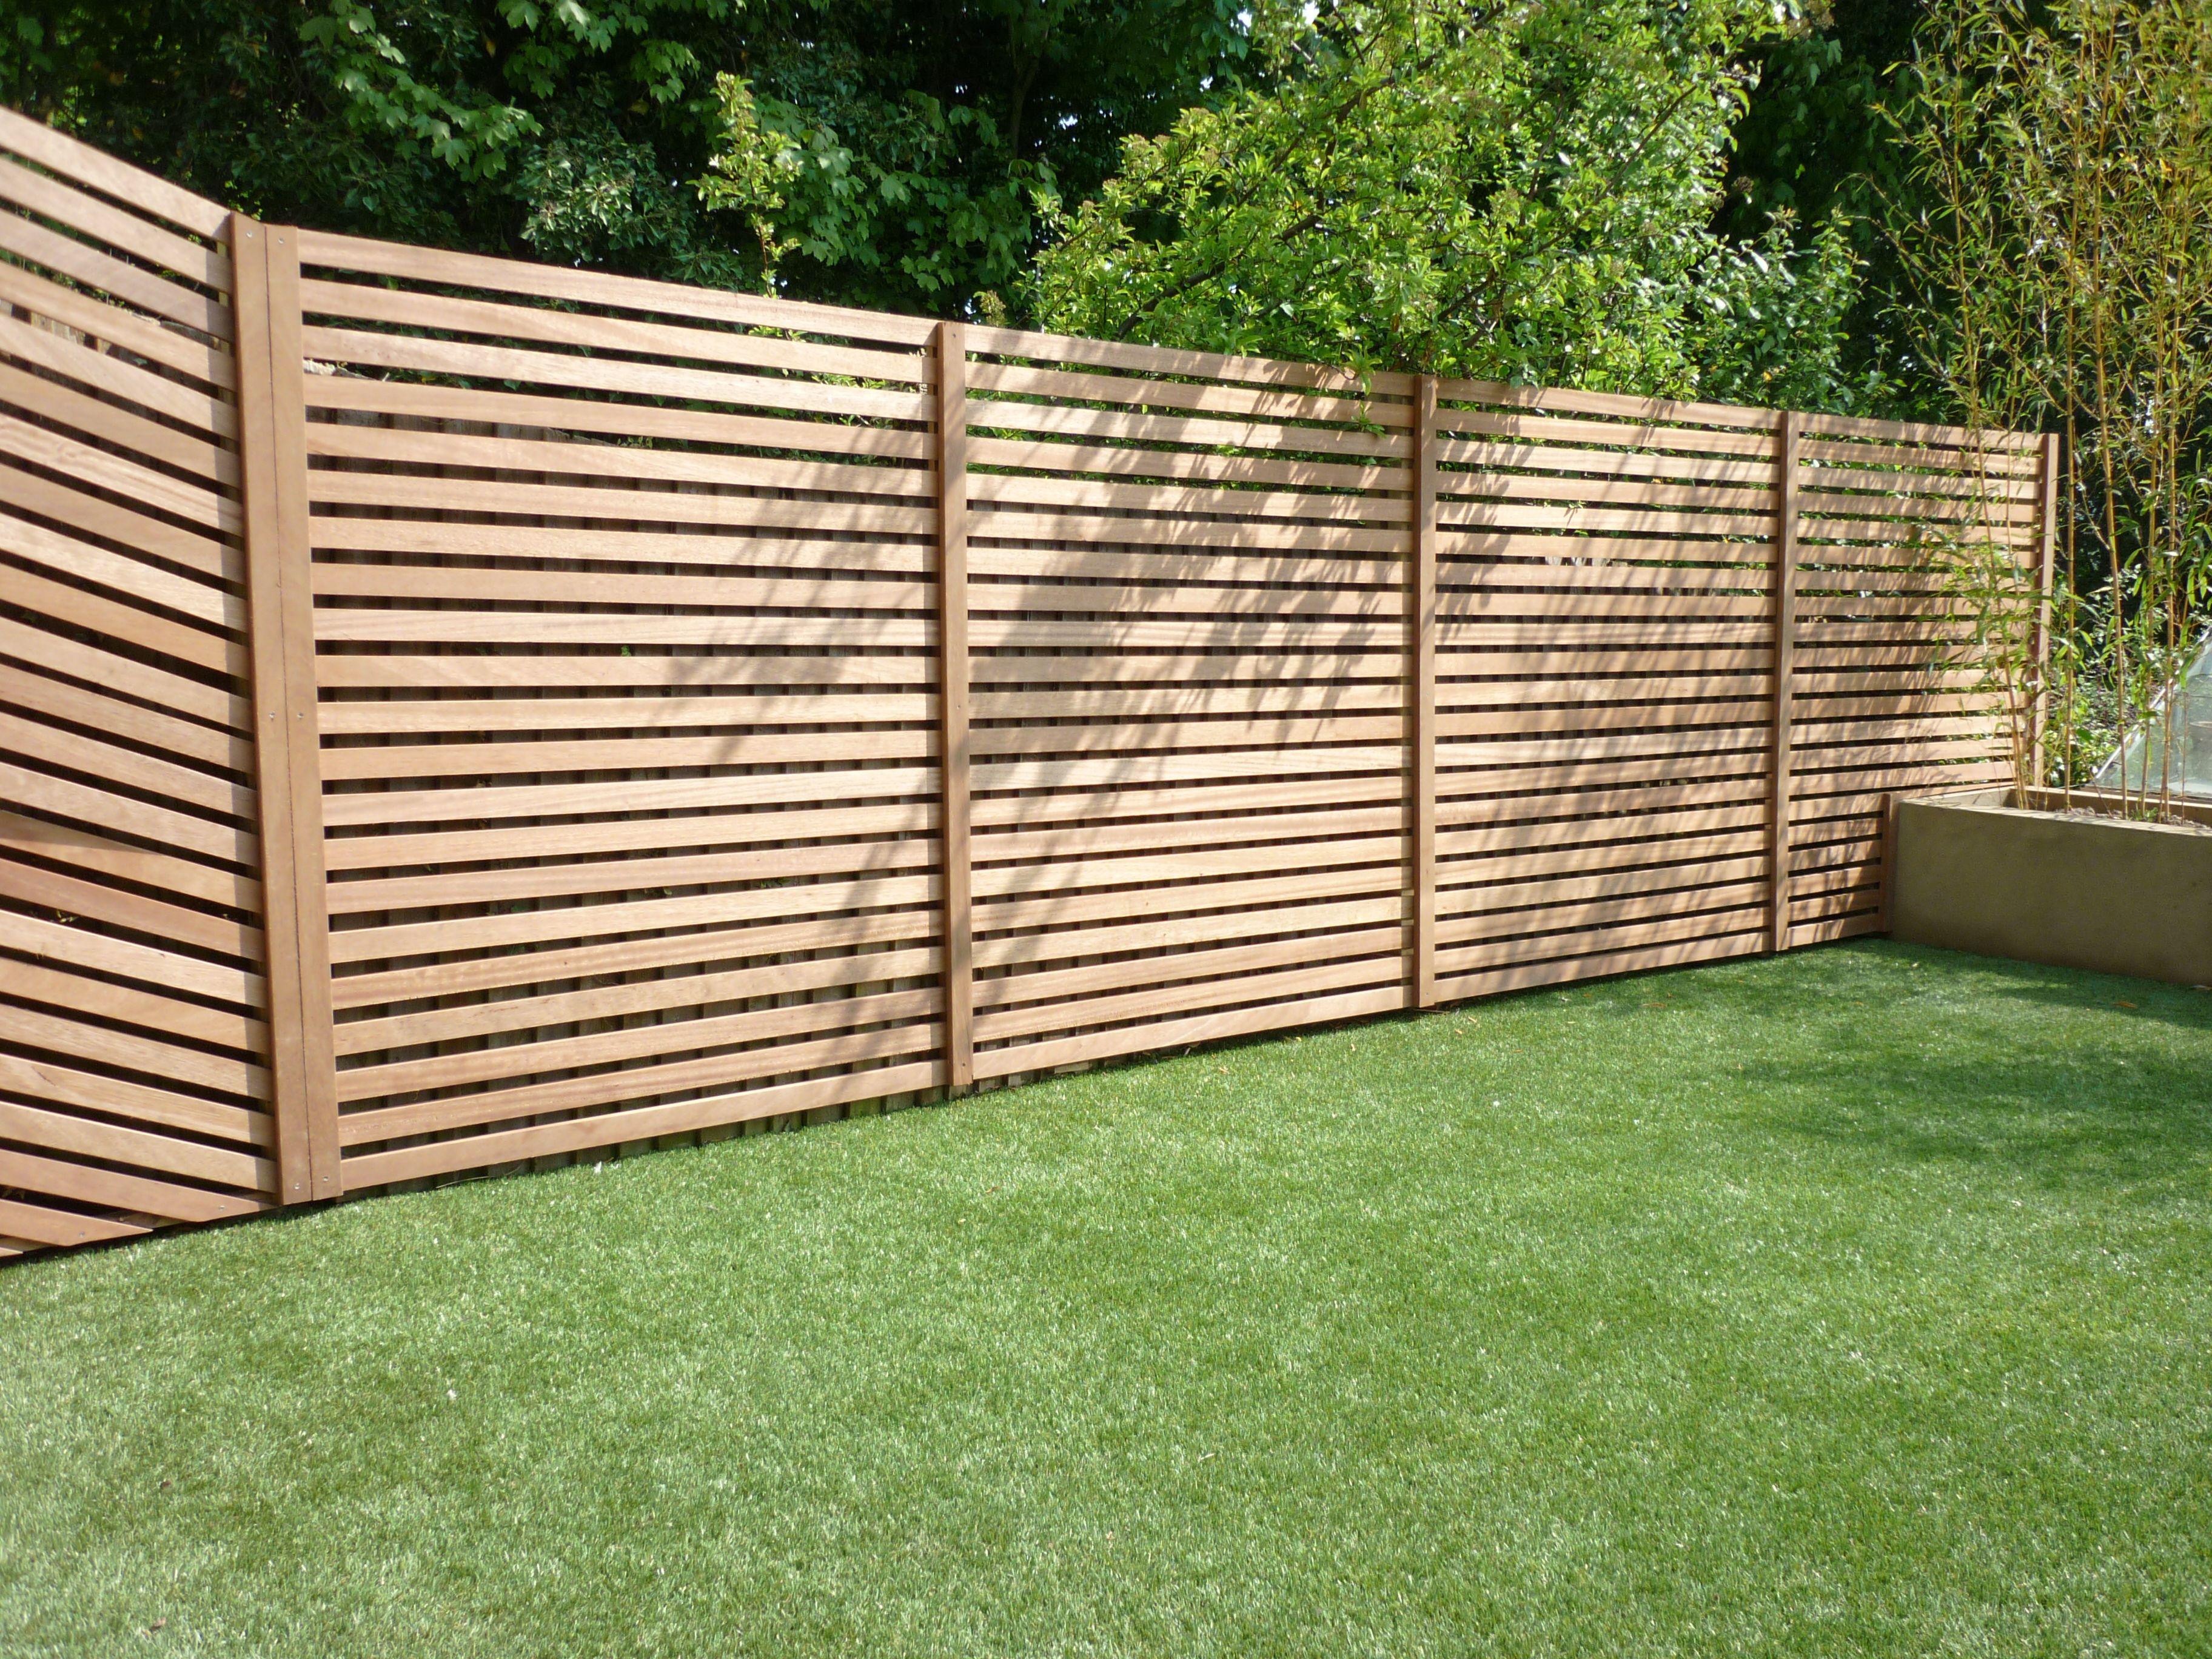 Iroko slatted fence Bespoke timberwork Pinterest